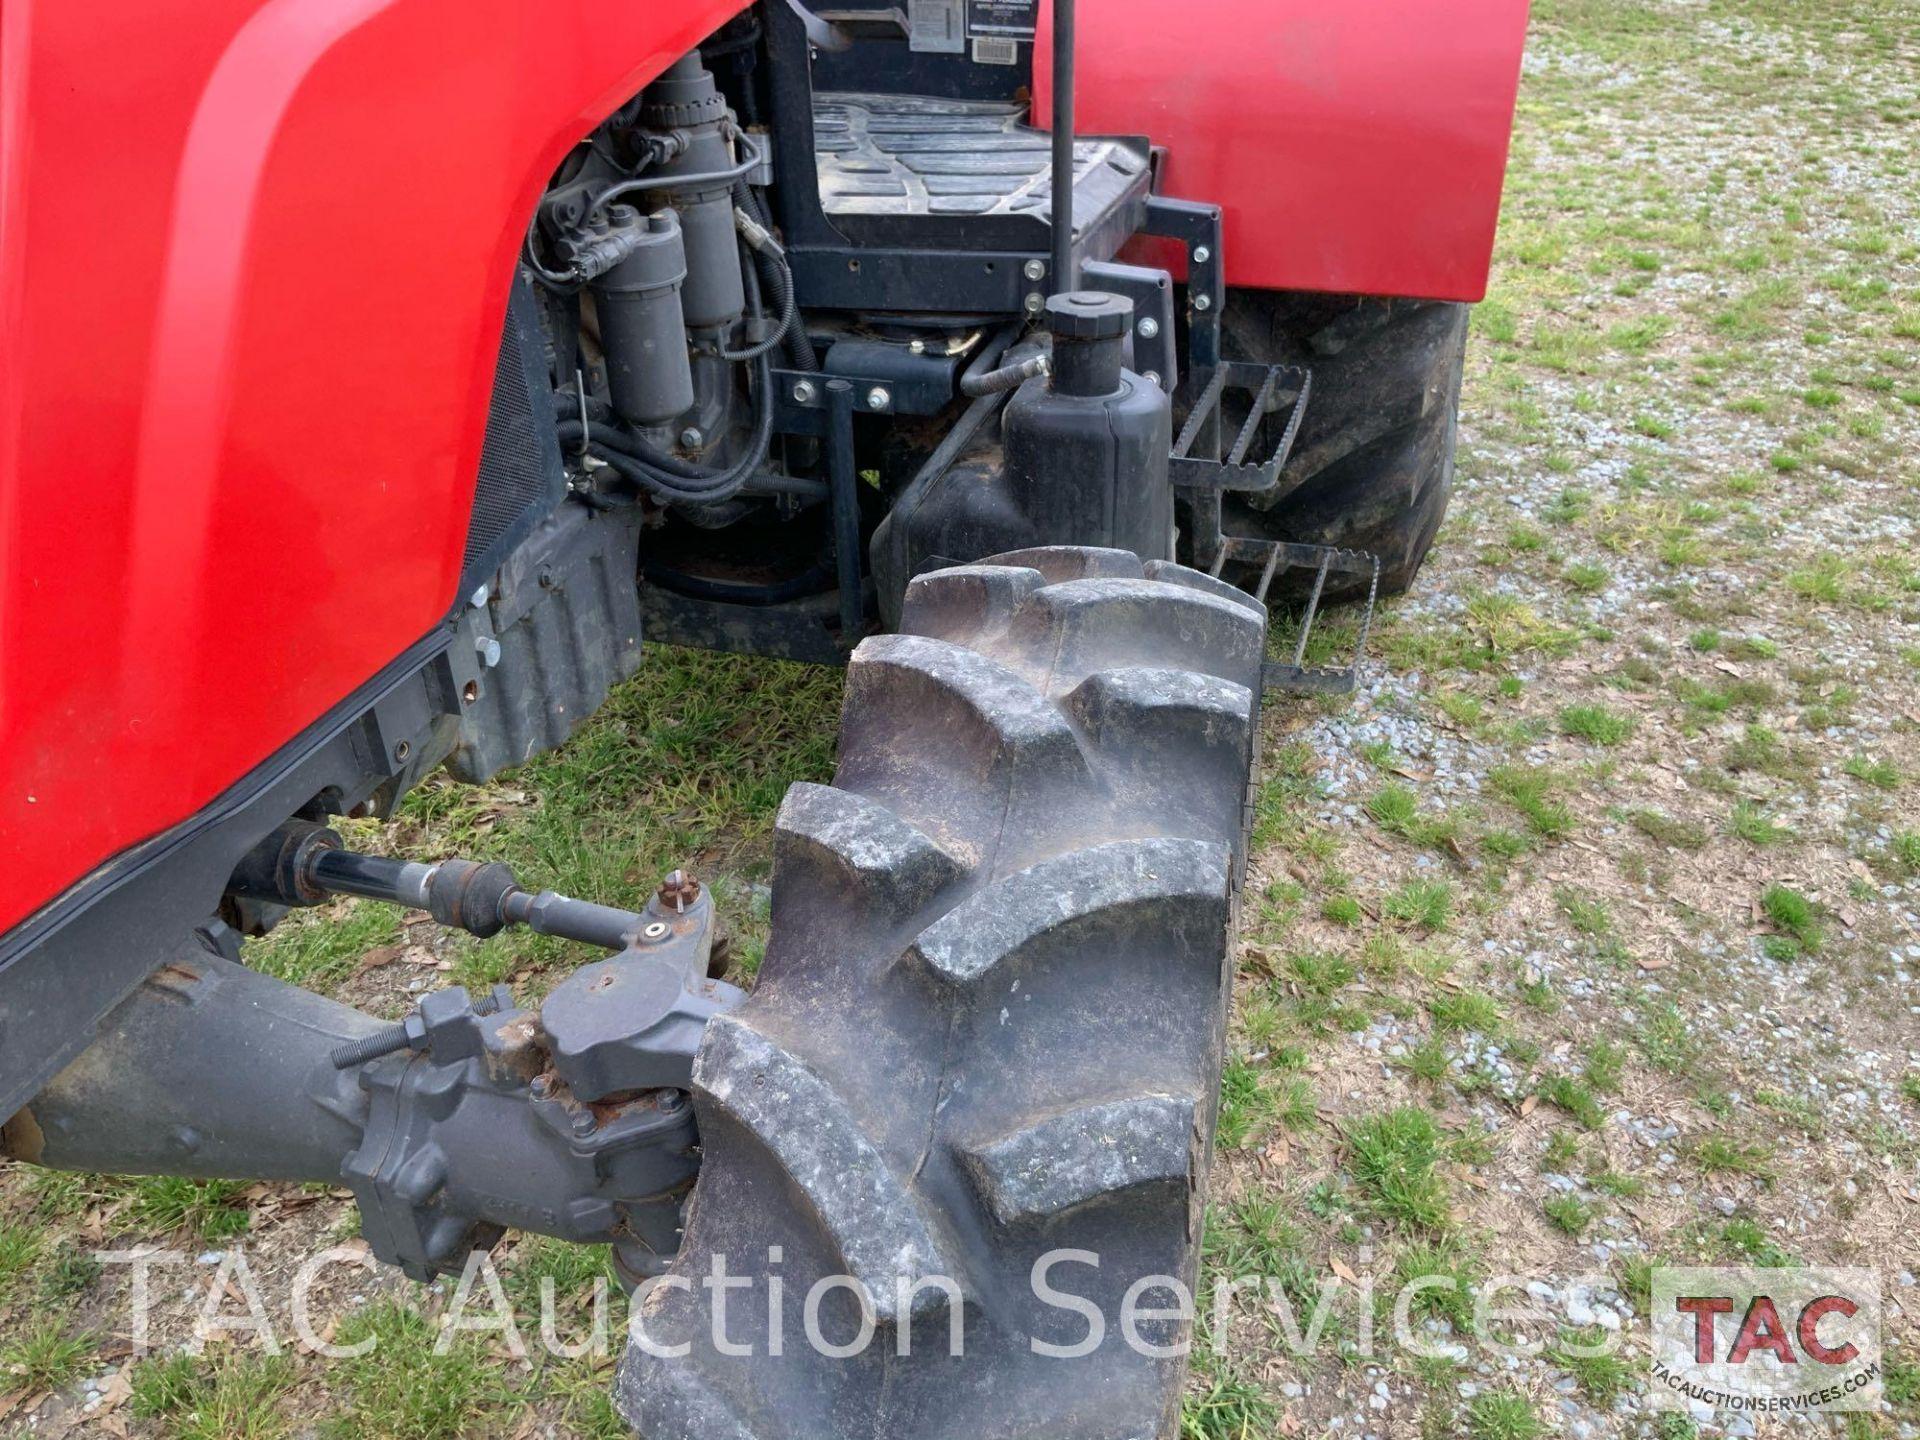 Massey-Ferguson 4610LP Farm Tractor - Image 25 of 26